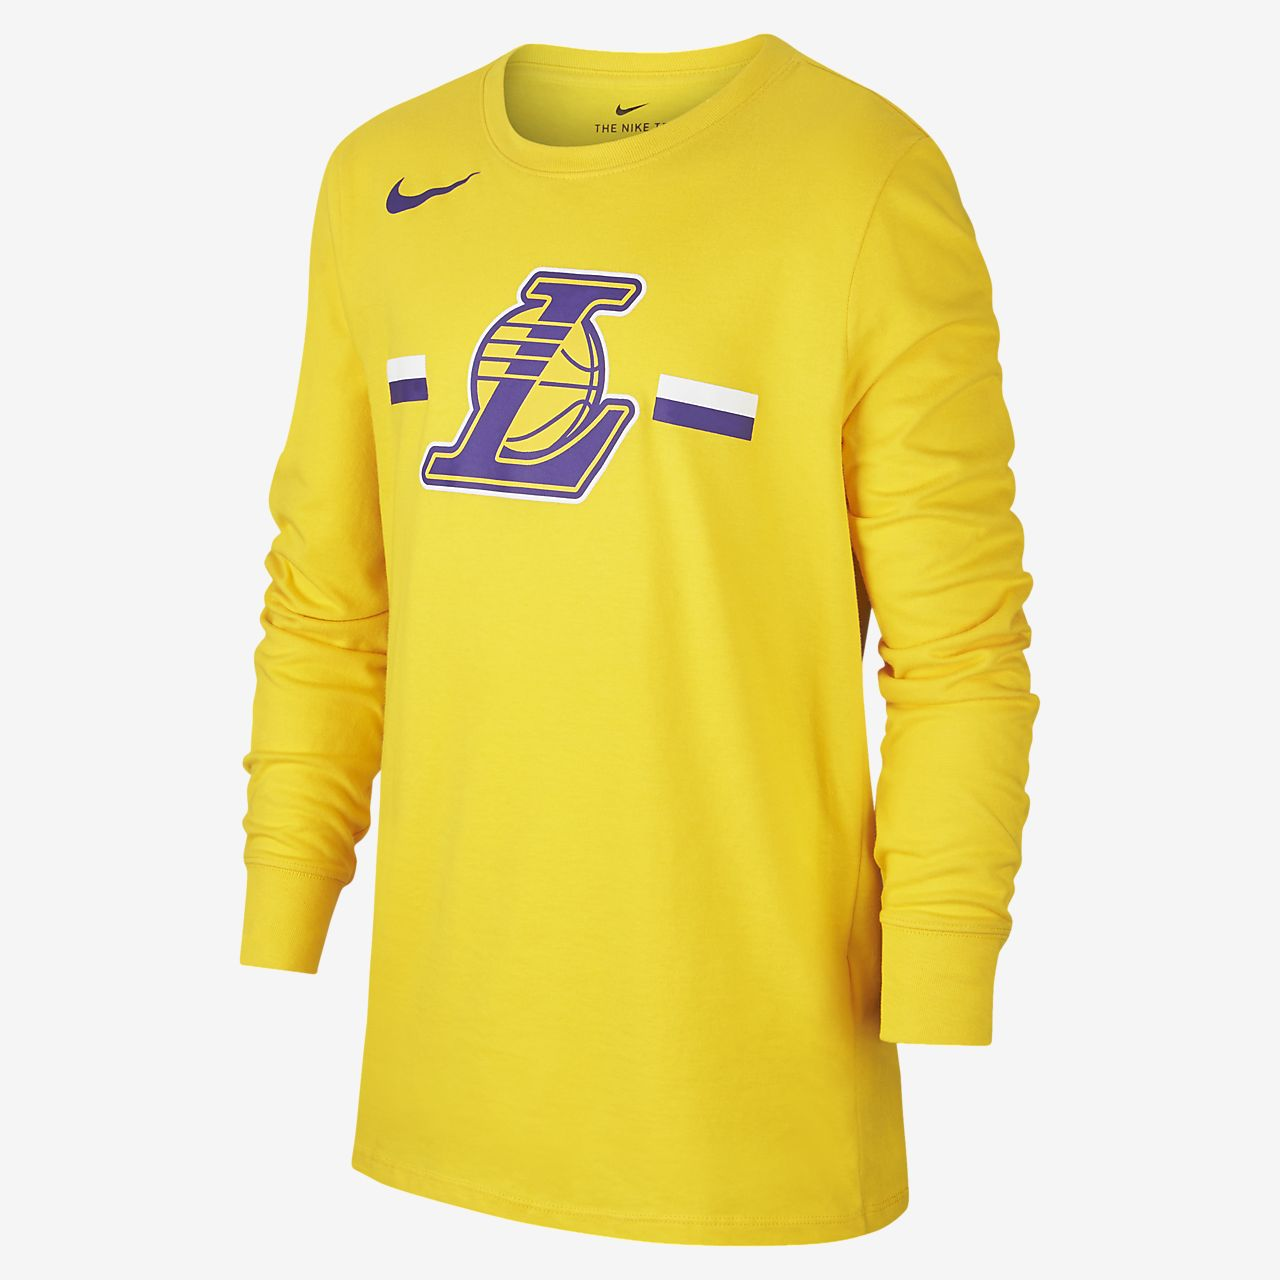 Los Angeles Lakers Nike Dri-FIT Logo NBA-kindershirt met lange mouwen